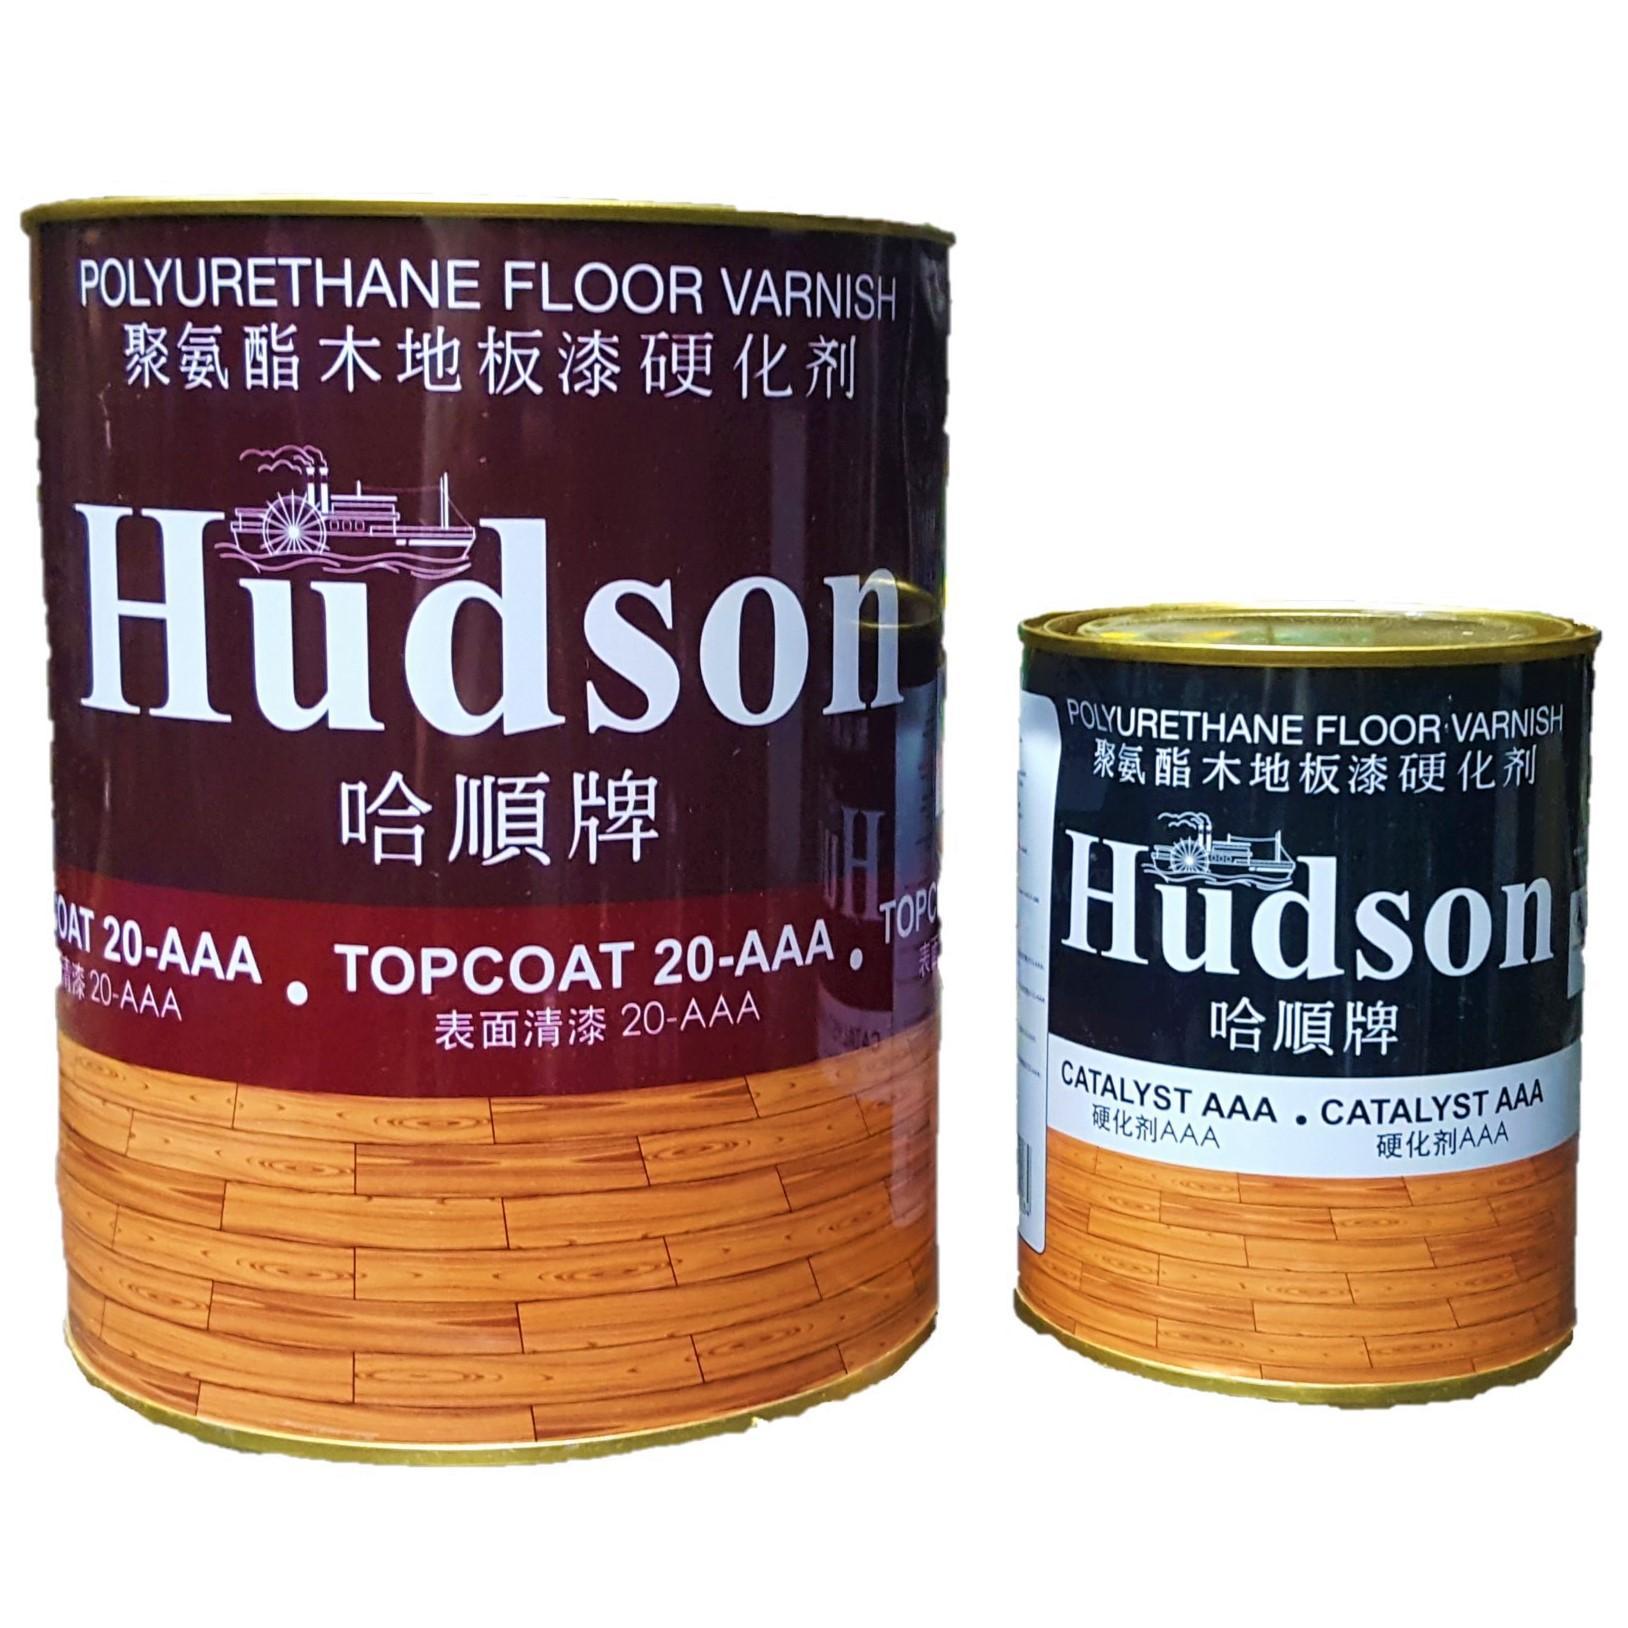 Hudson Polyurethane Floor Varnish Topcoat - 1L or 4L | Lazada PH